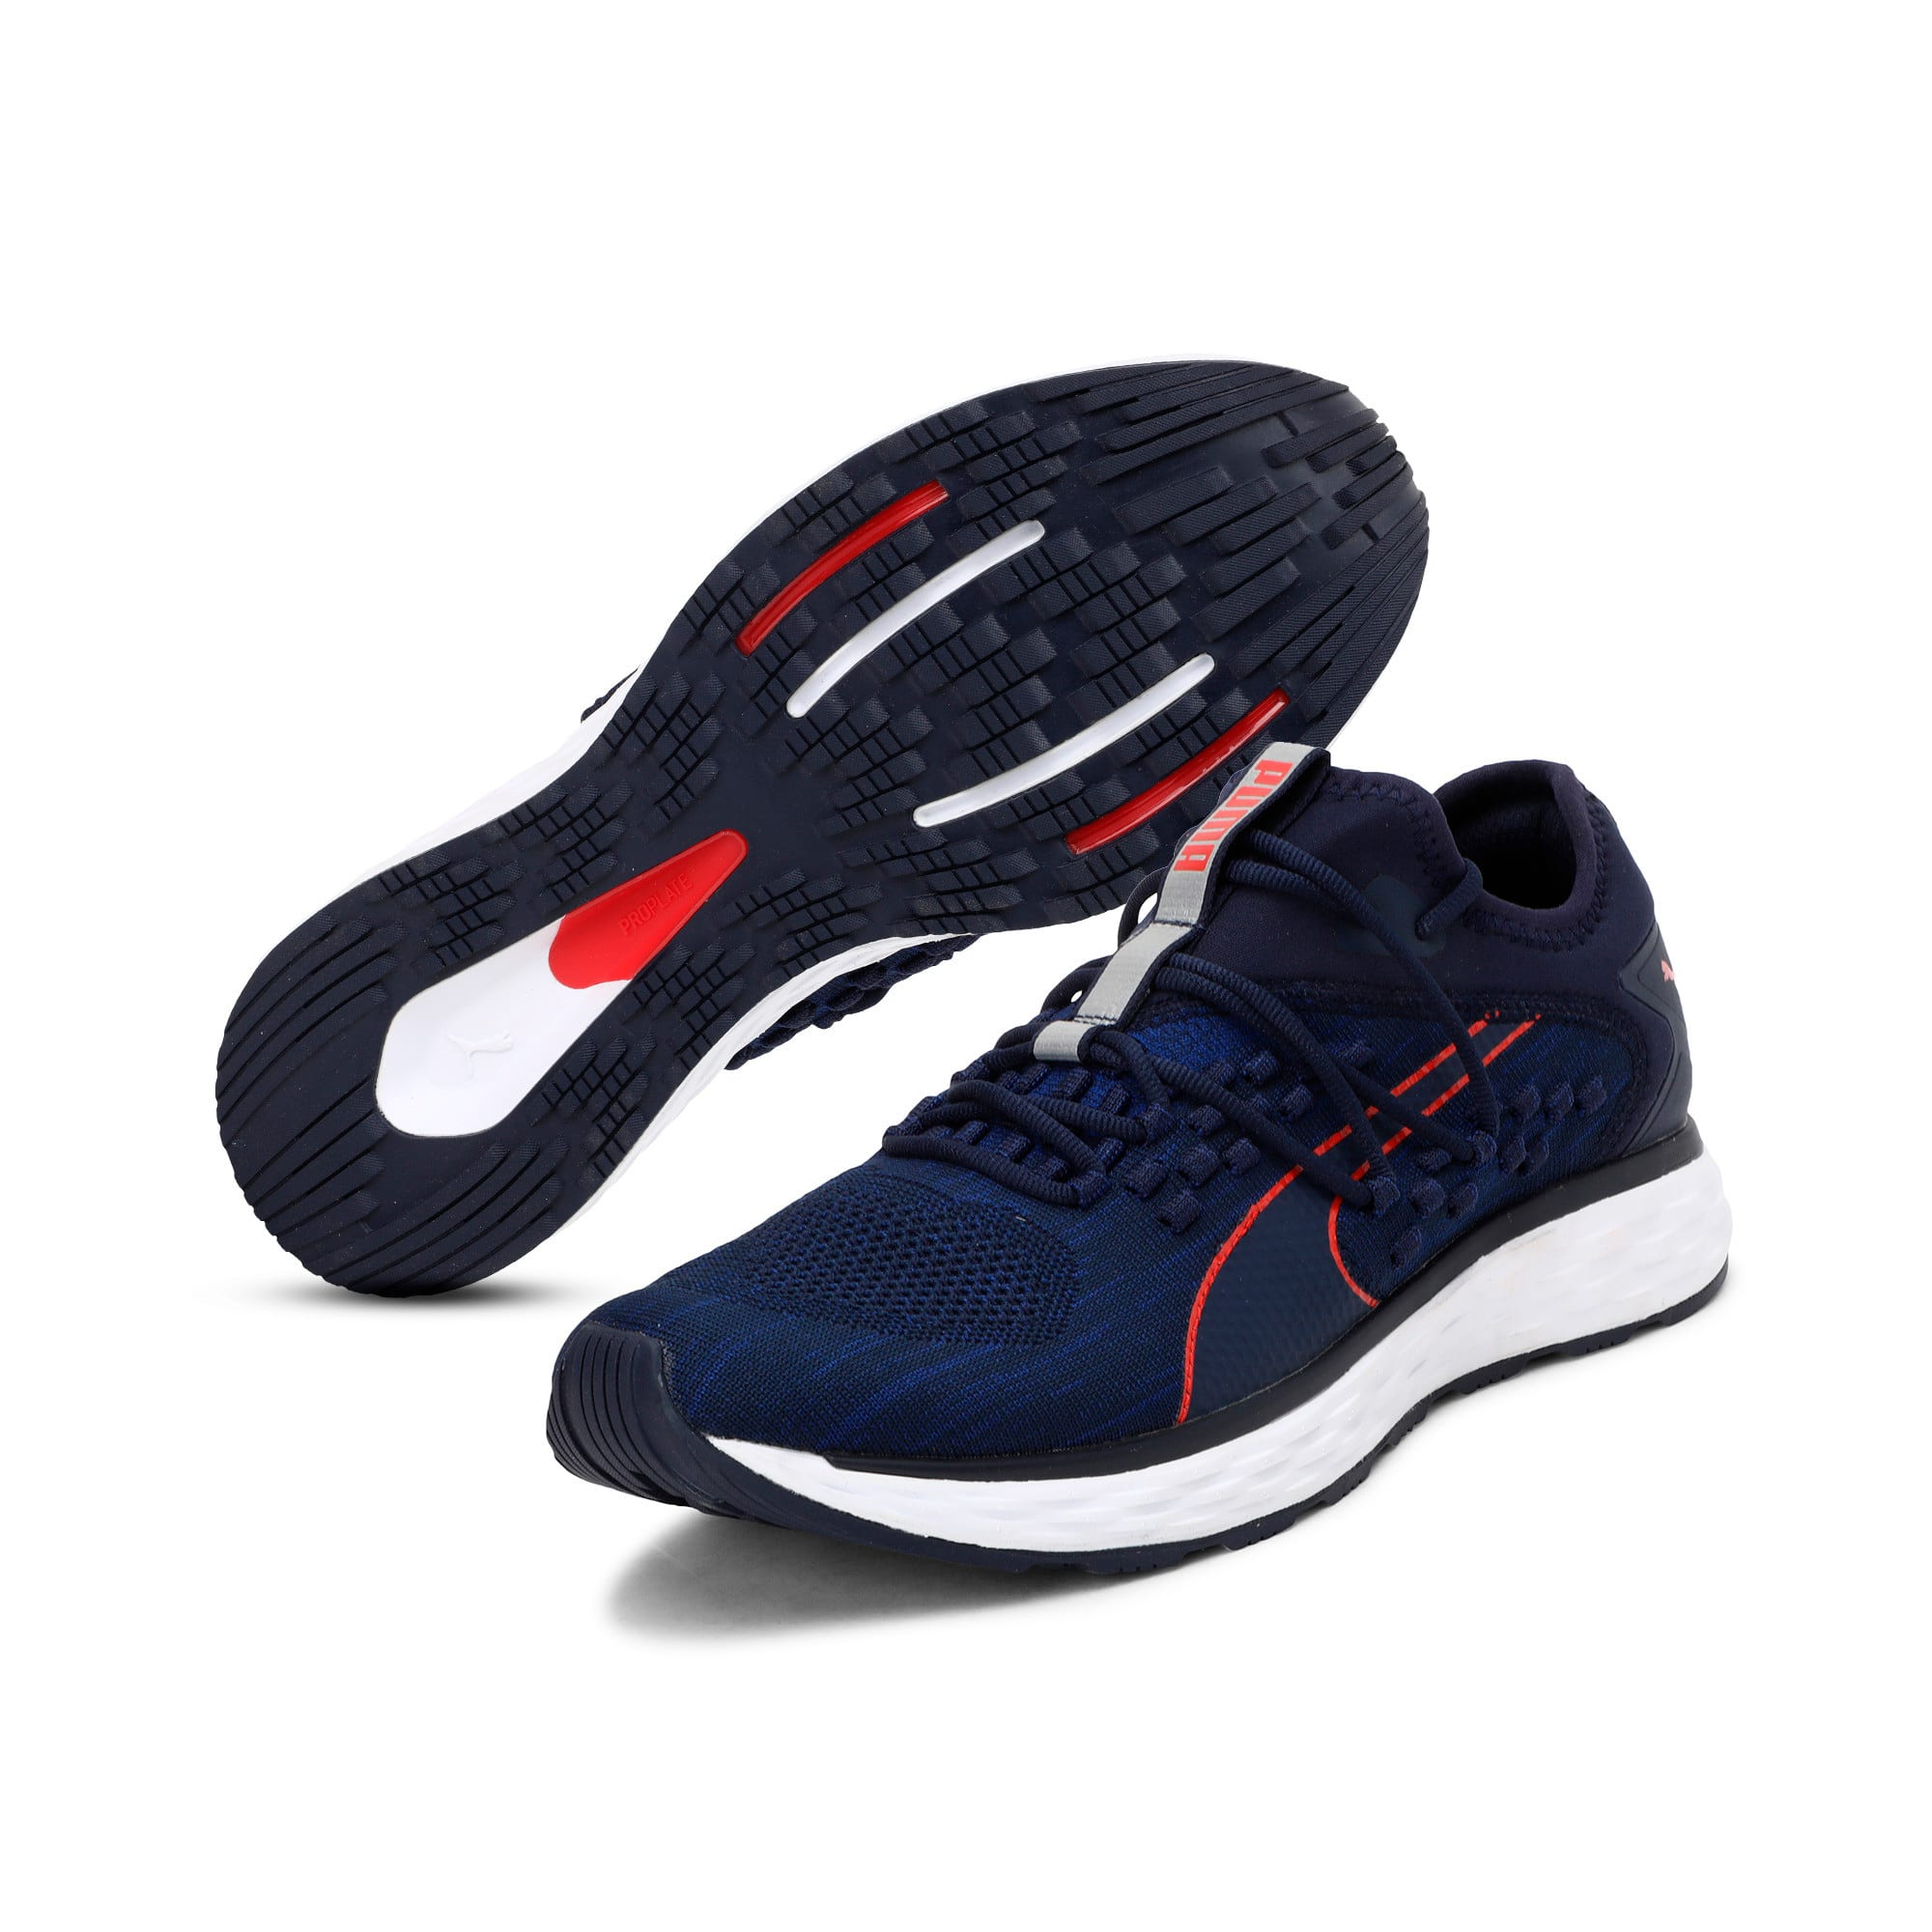 Thumbnail 3 of SPEED FUSEFIT Men's Running Shoes, Peacoat-Sodalite Blue, medium-IND